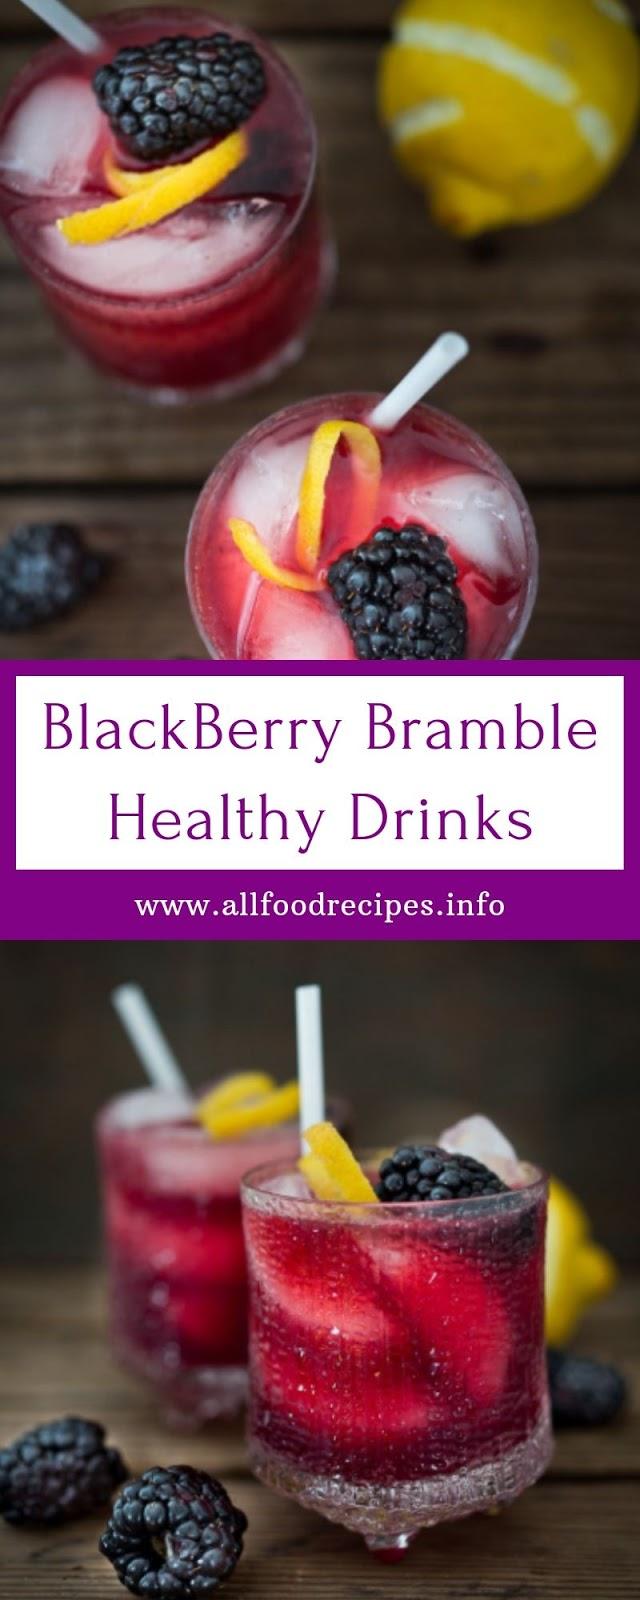 BlackBerry Bramble Healthy Drinks